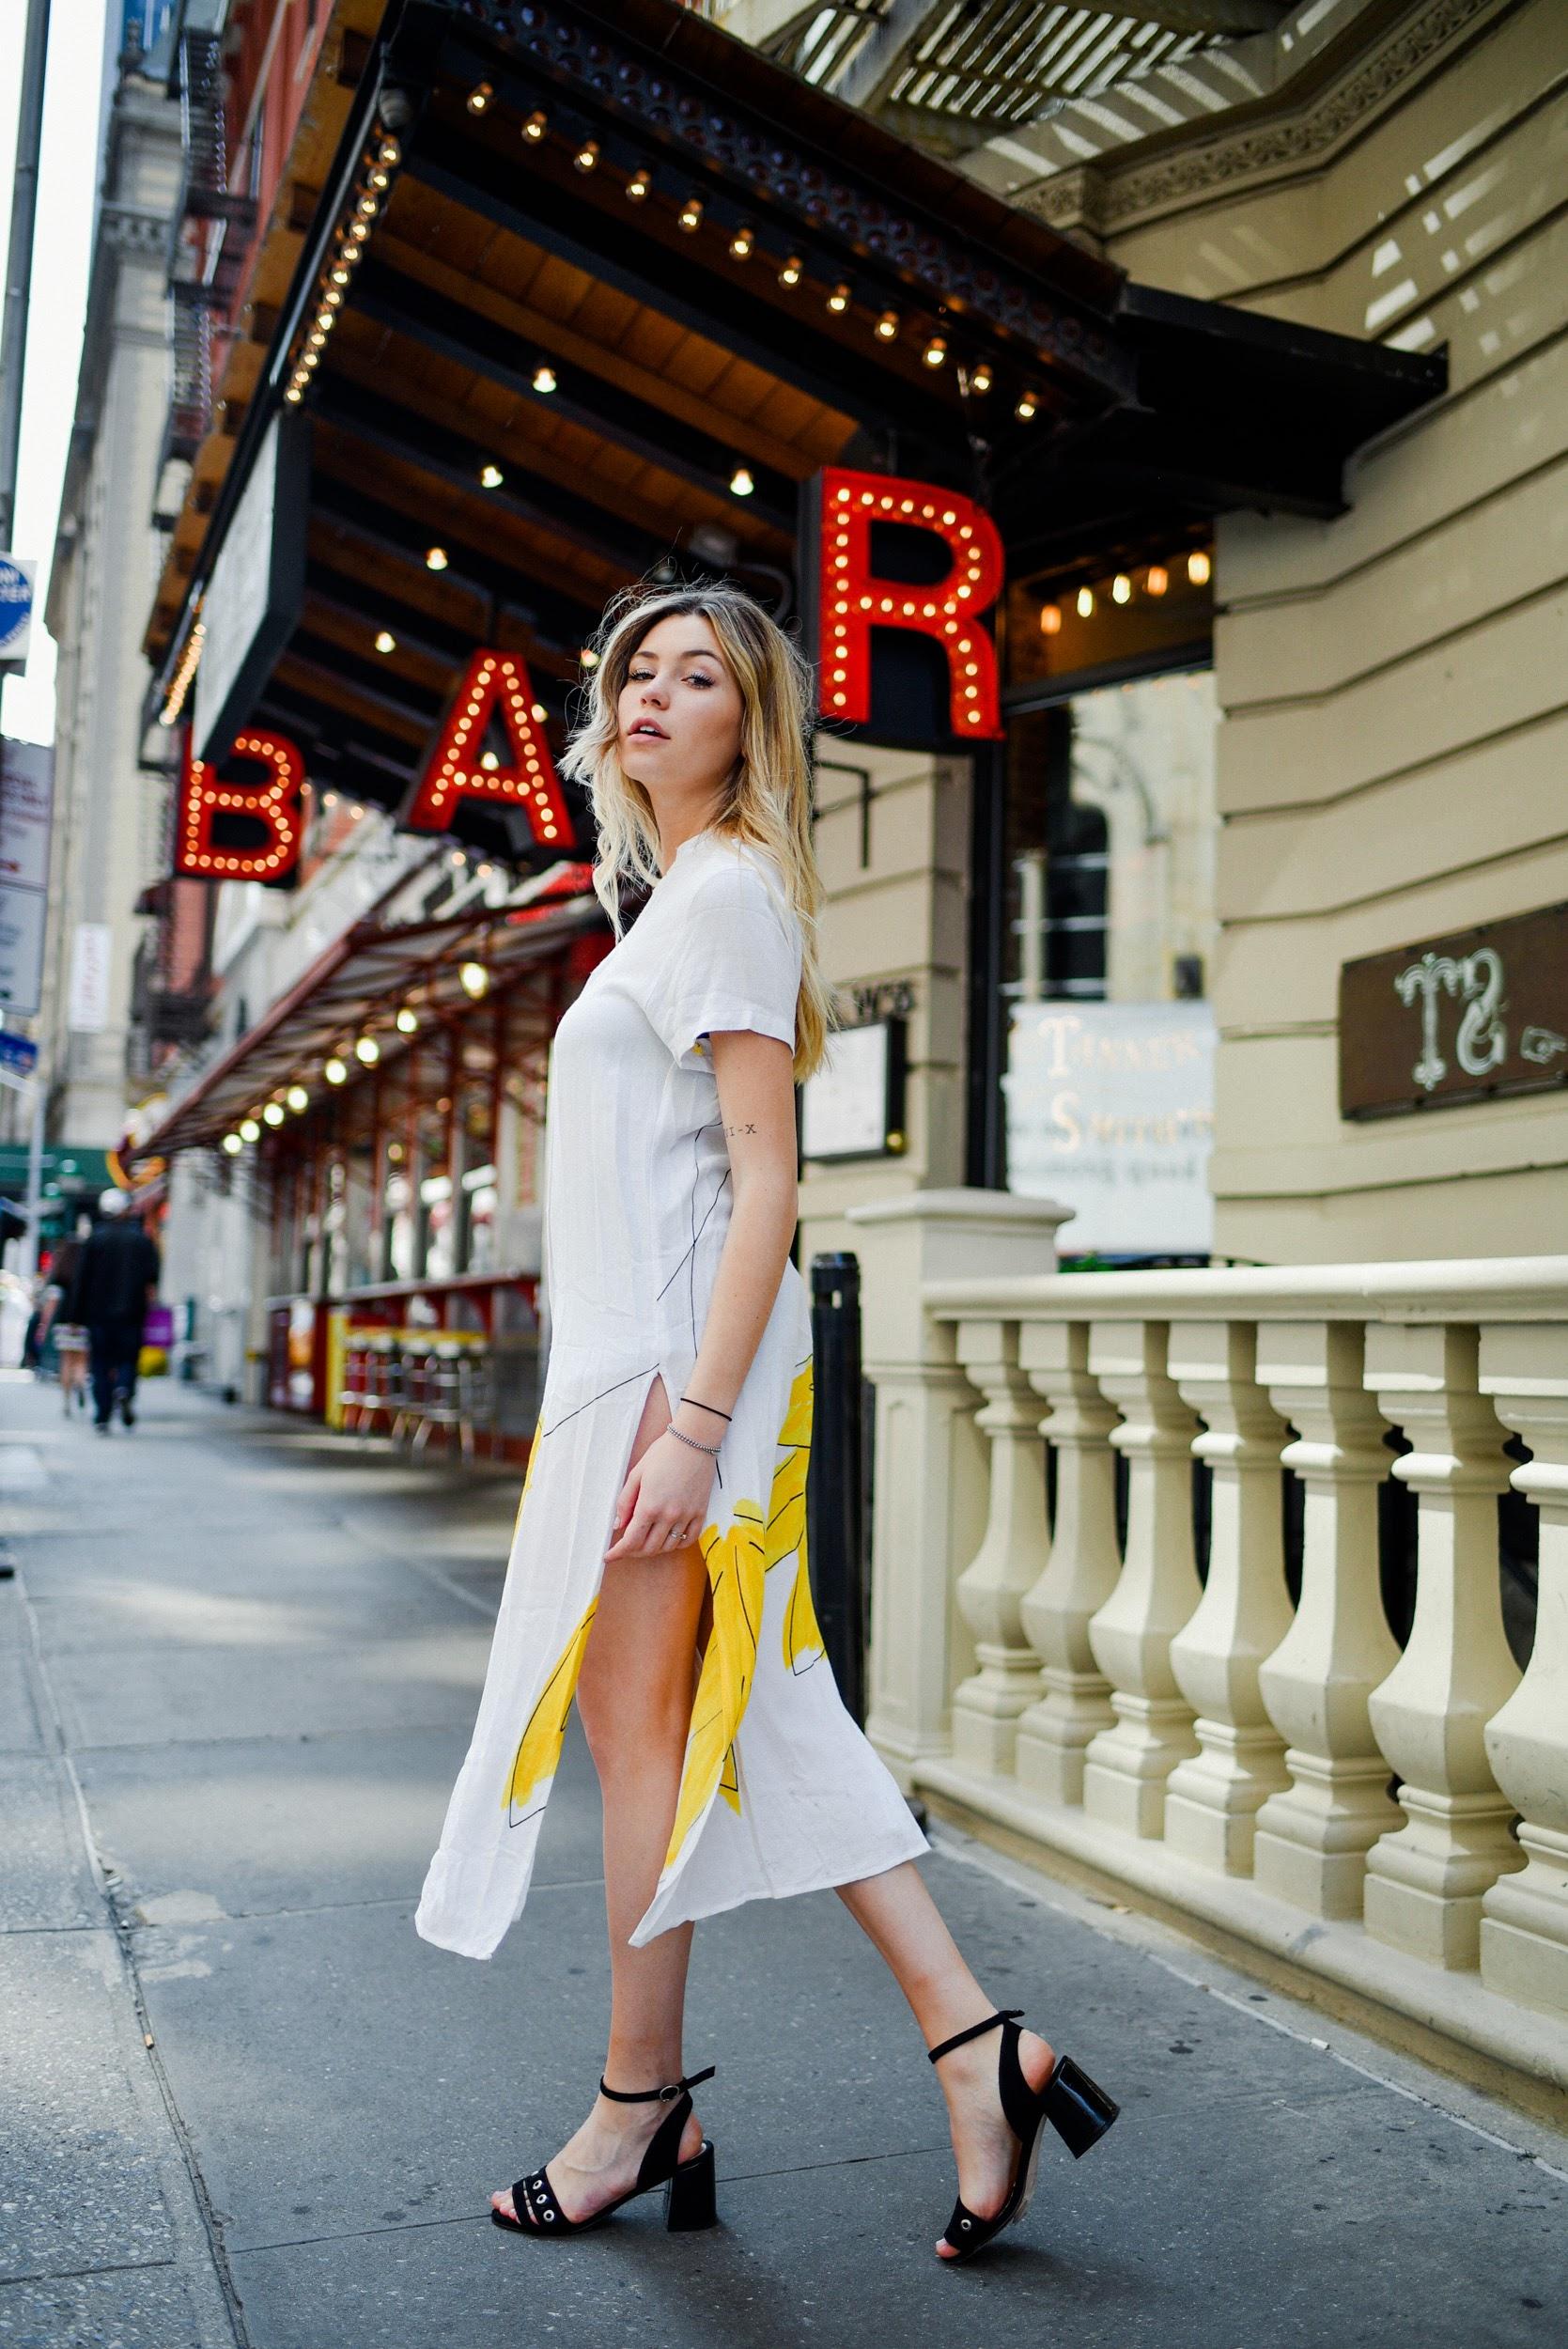 Cami Orsi NYC - By Malvina Battiston 151.JPG